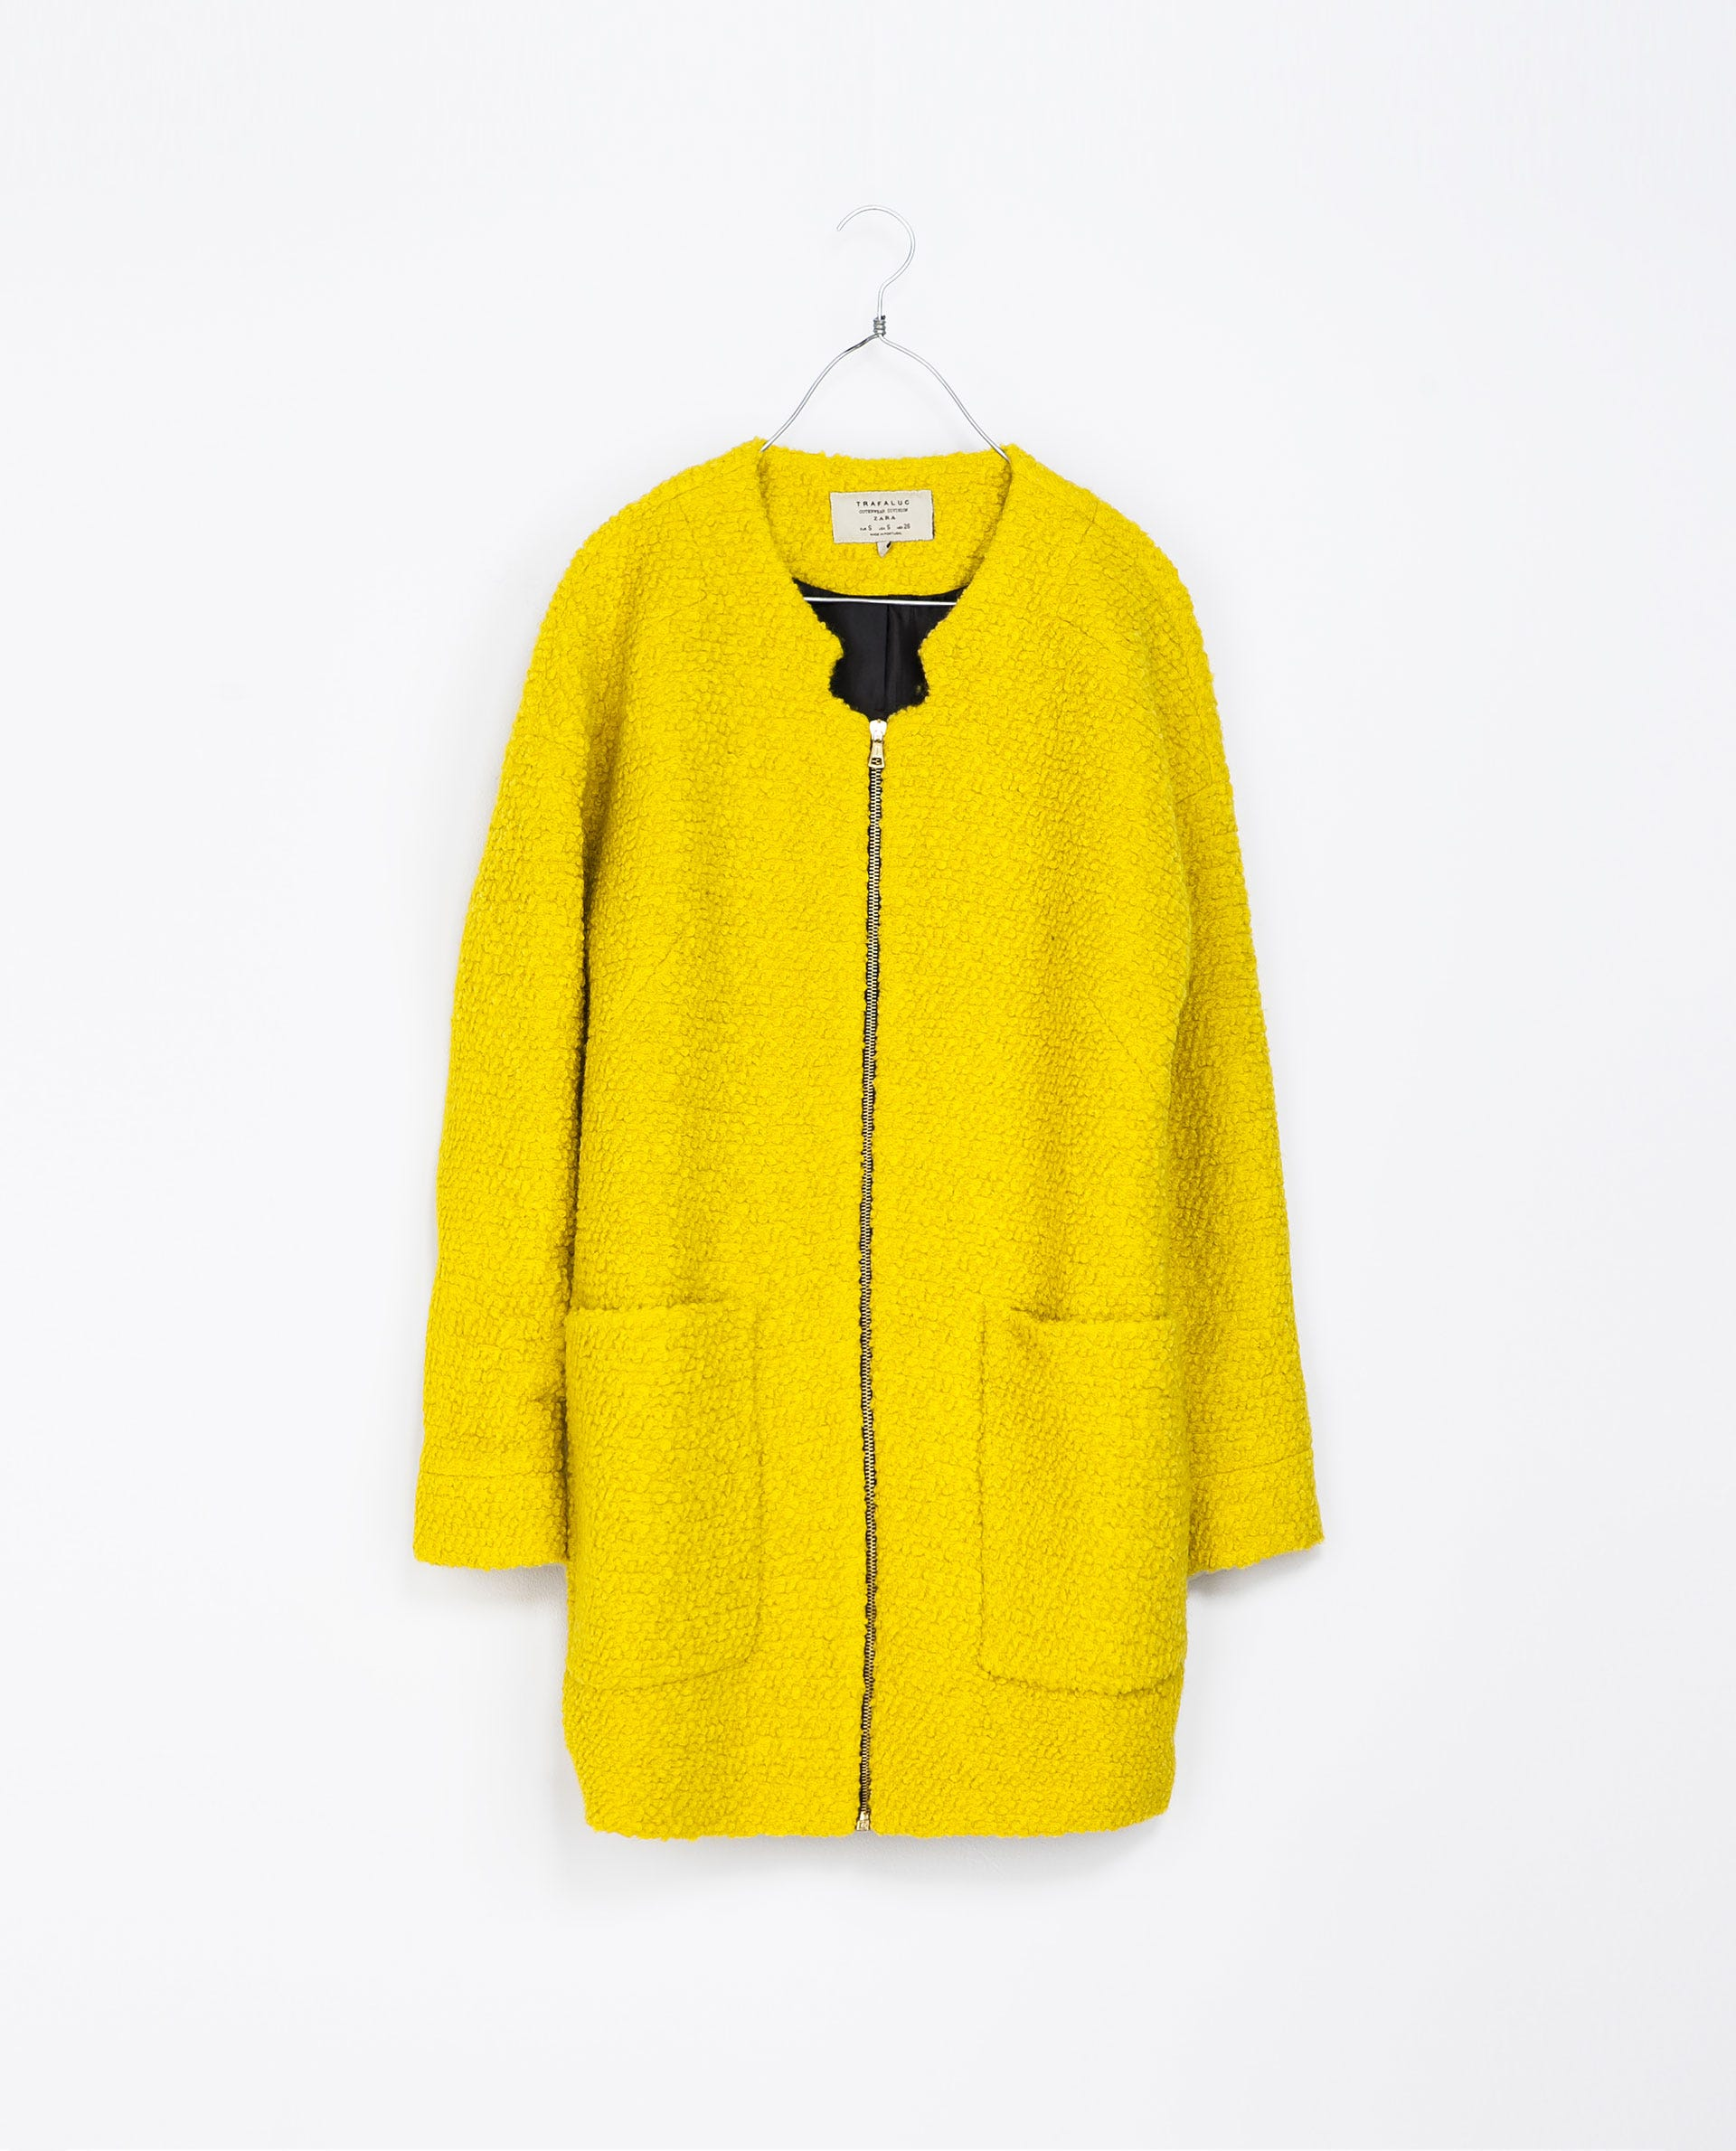 cc7649b9 Wool Coat With Center Zip